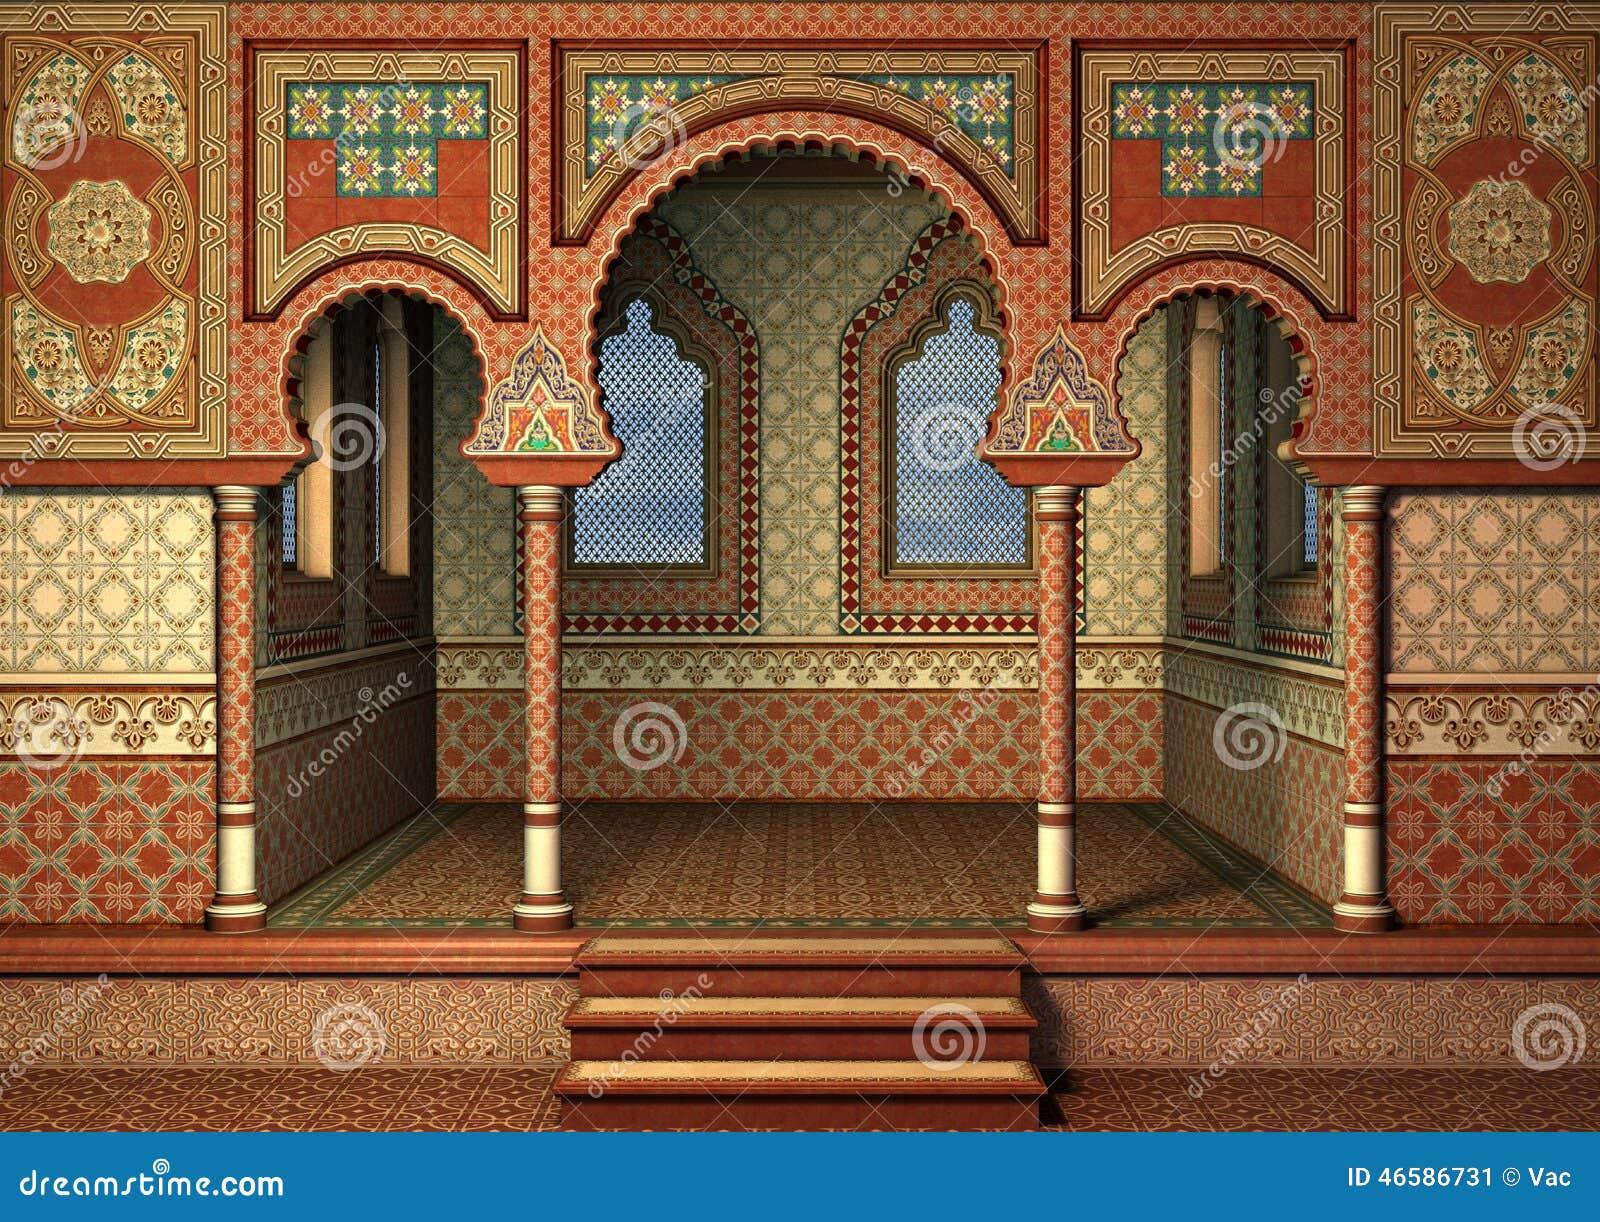 orientalischer palast stock abbildung bild 46586731. Black Bedroom Furniture Sets. Home Design Ideas